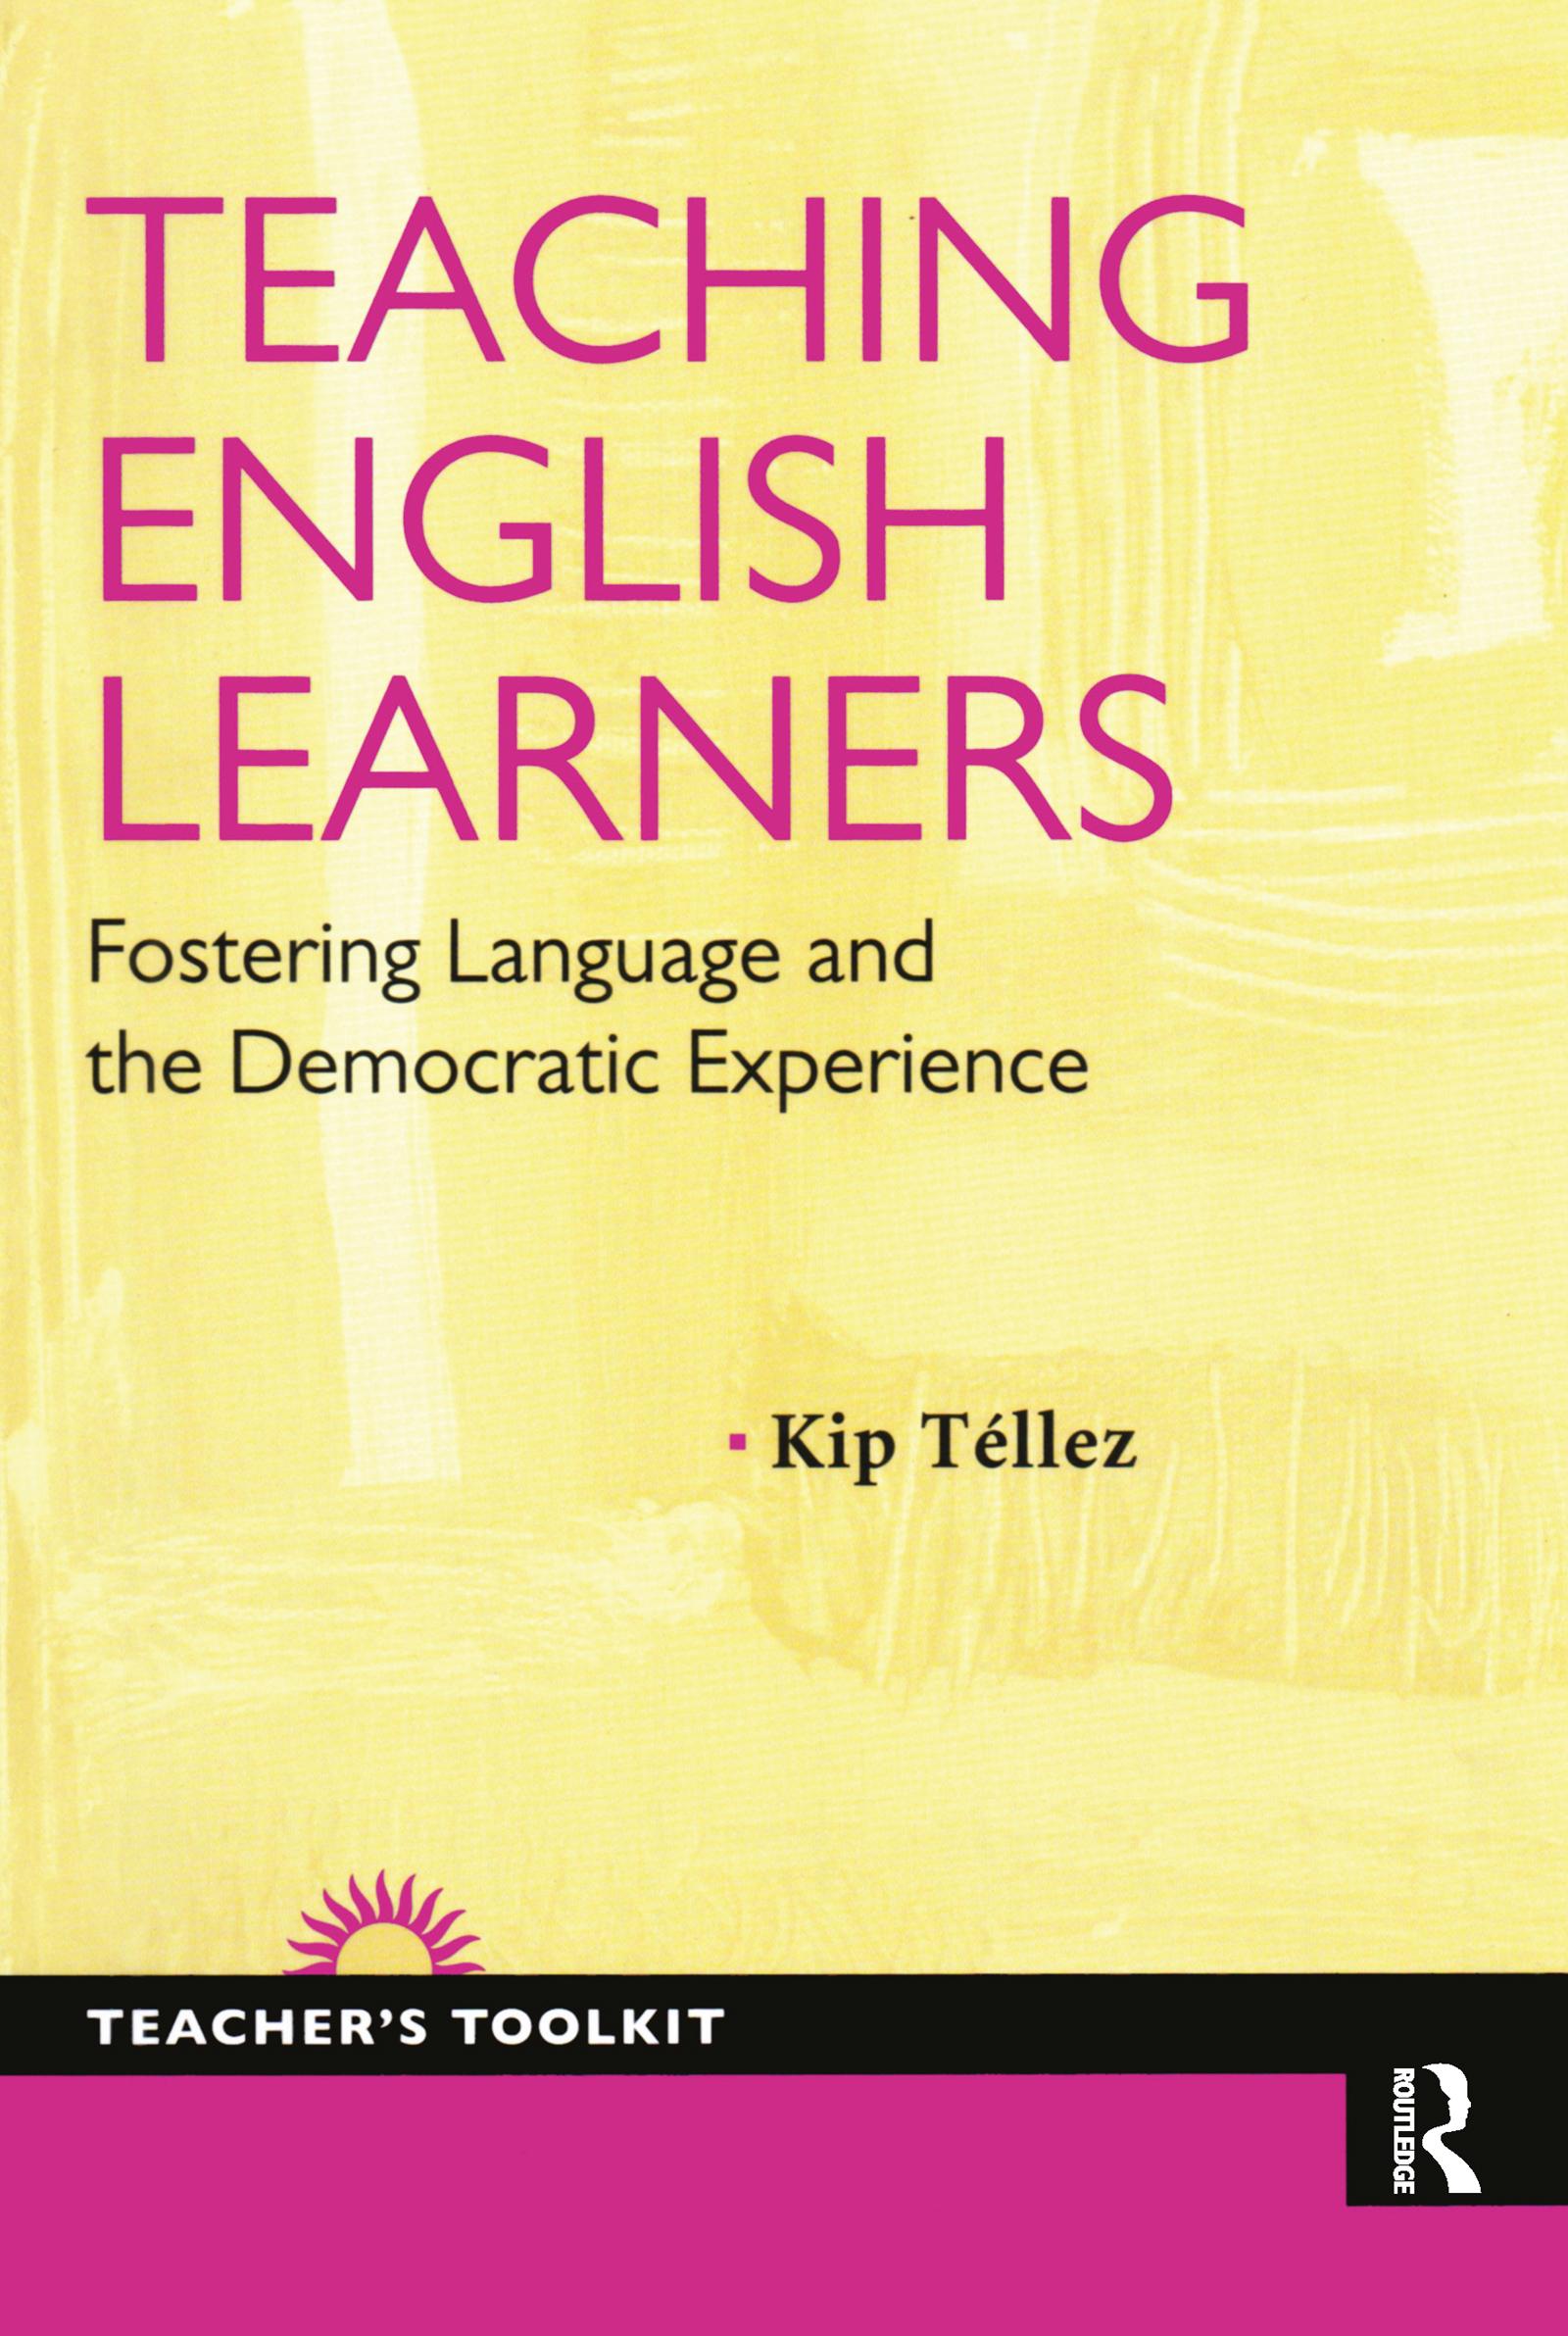 Teaching English Learners